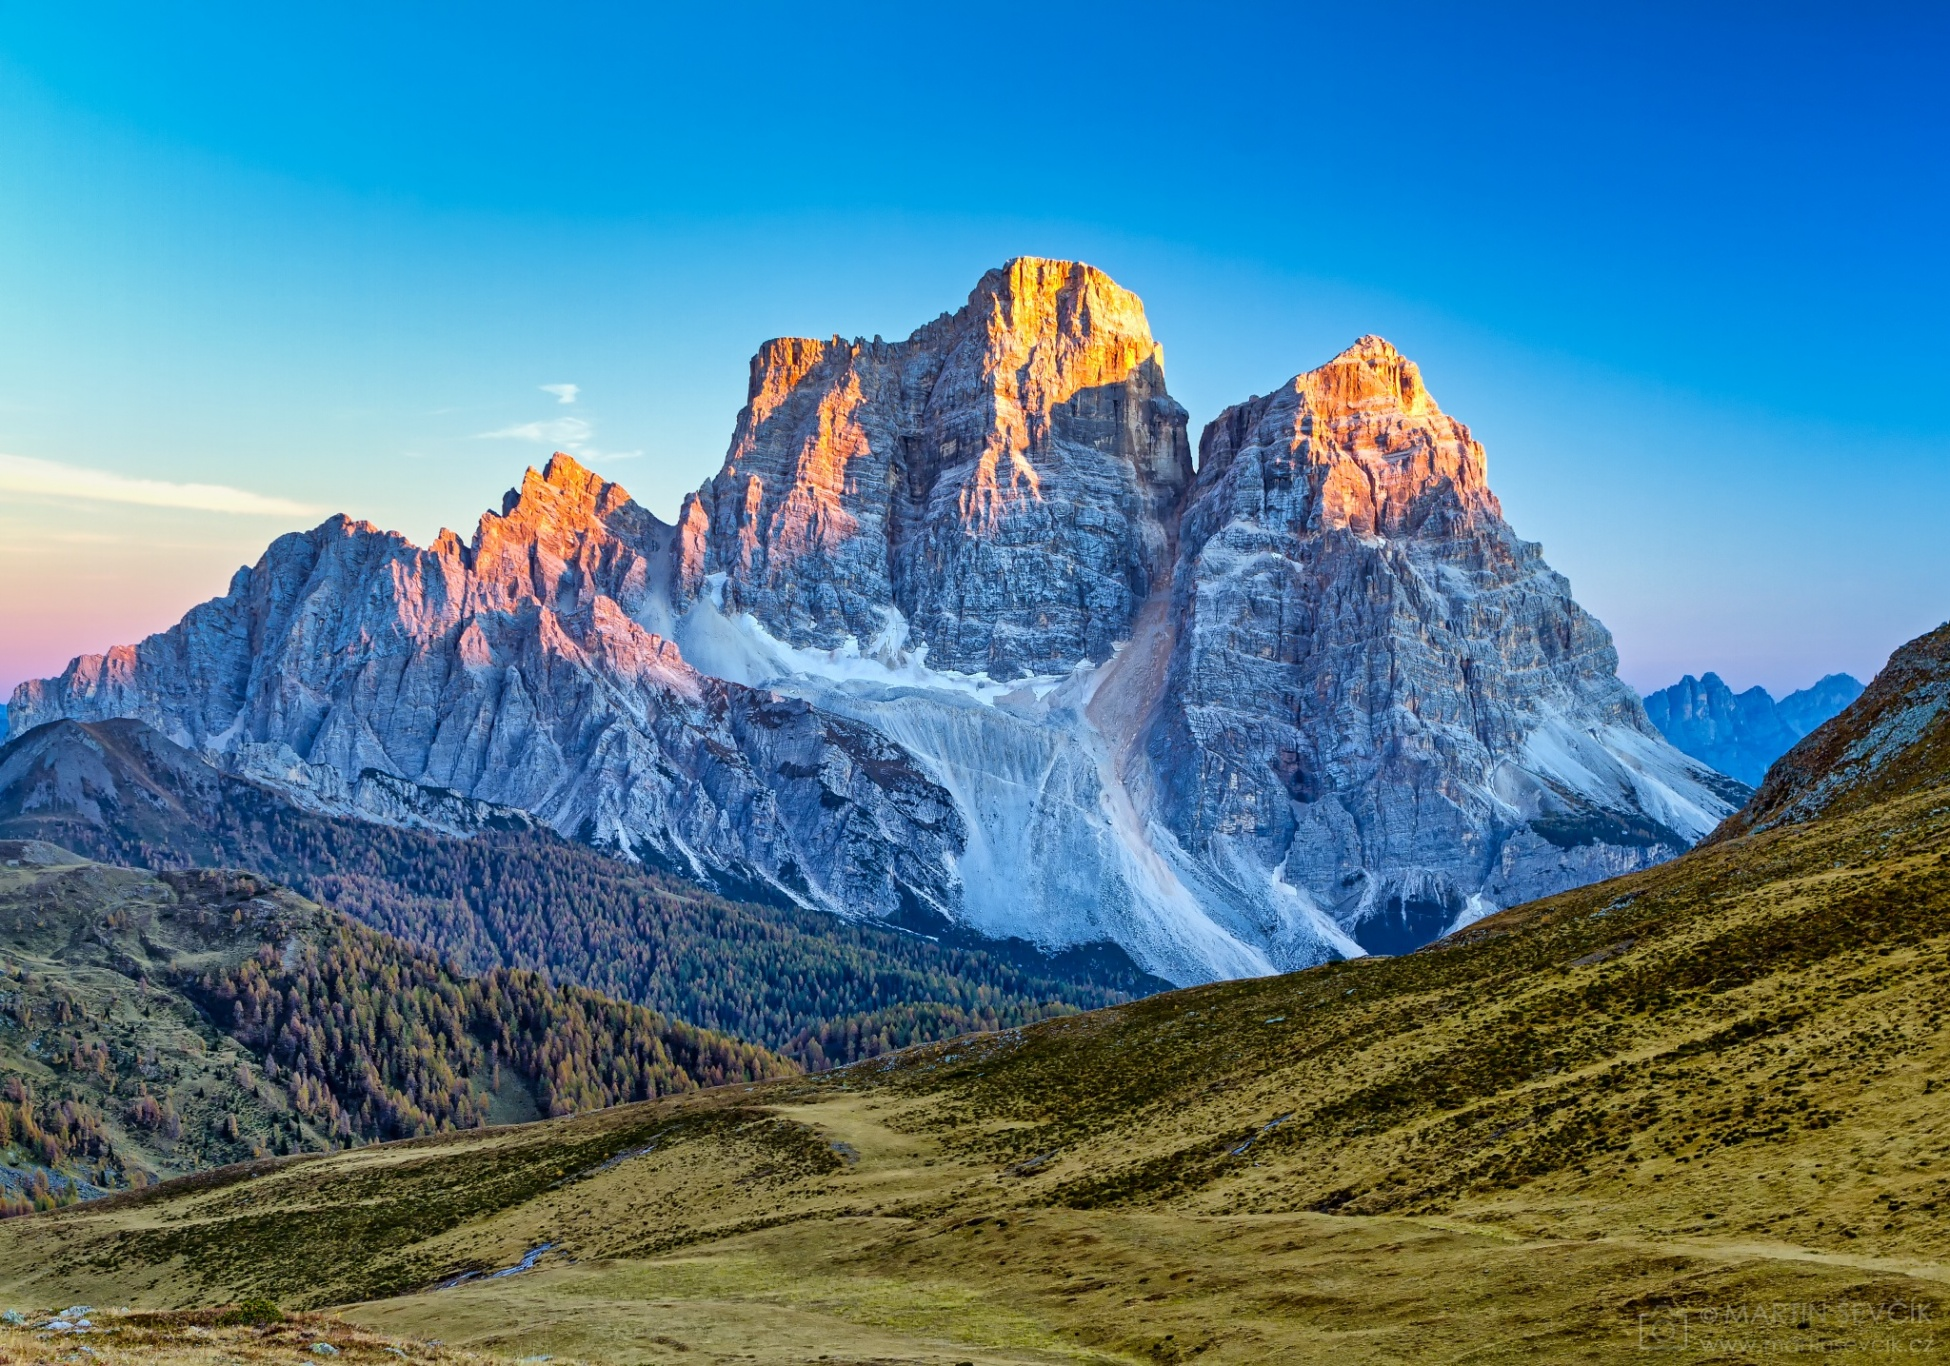 Krajina_Dolomity-Italie